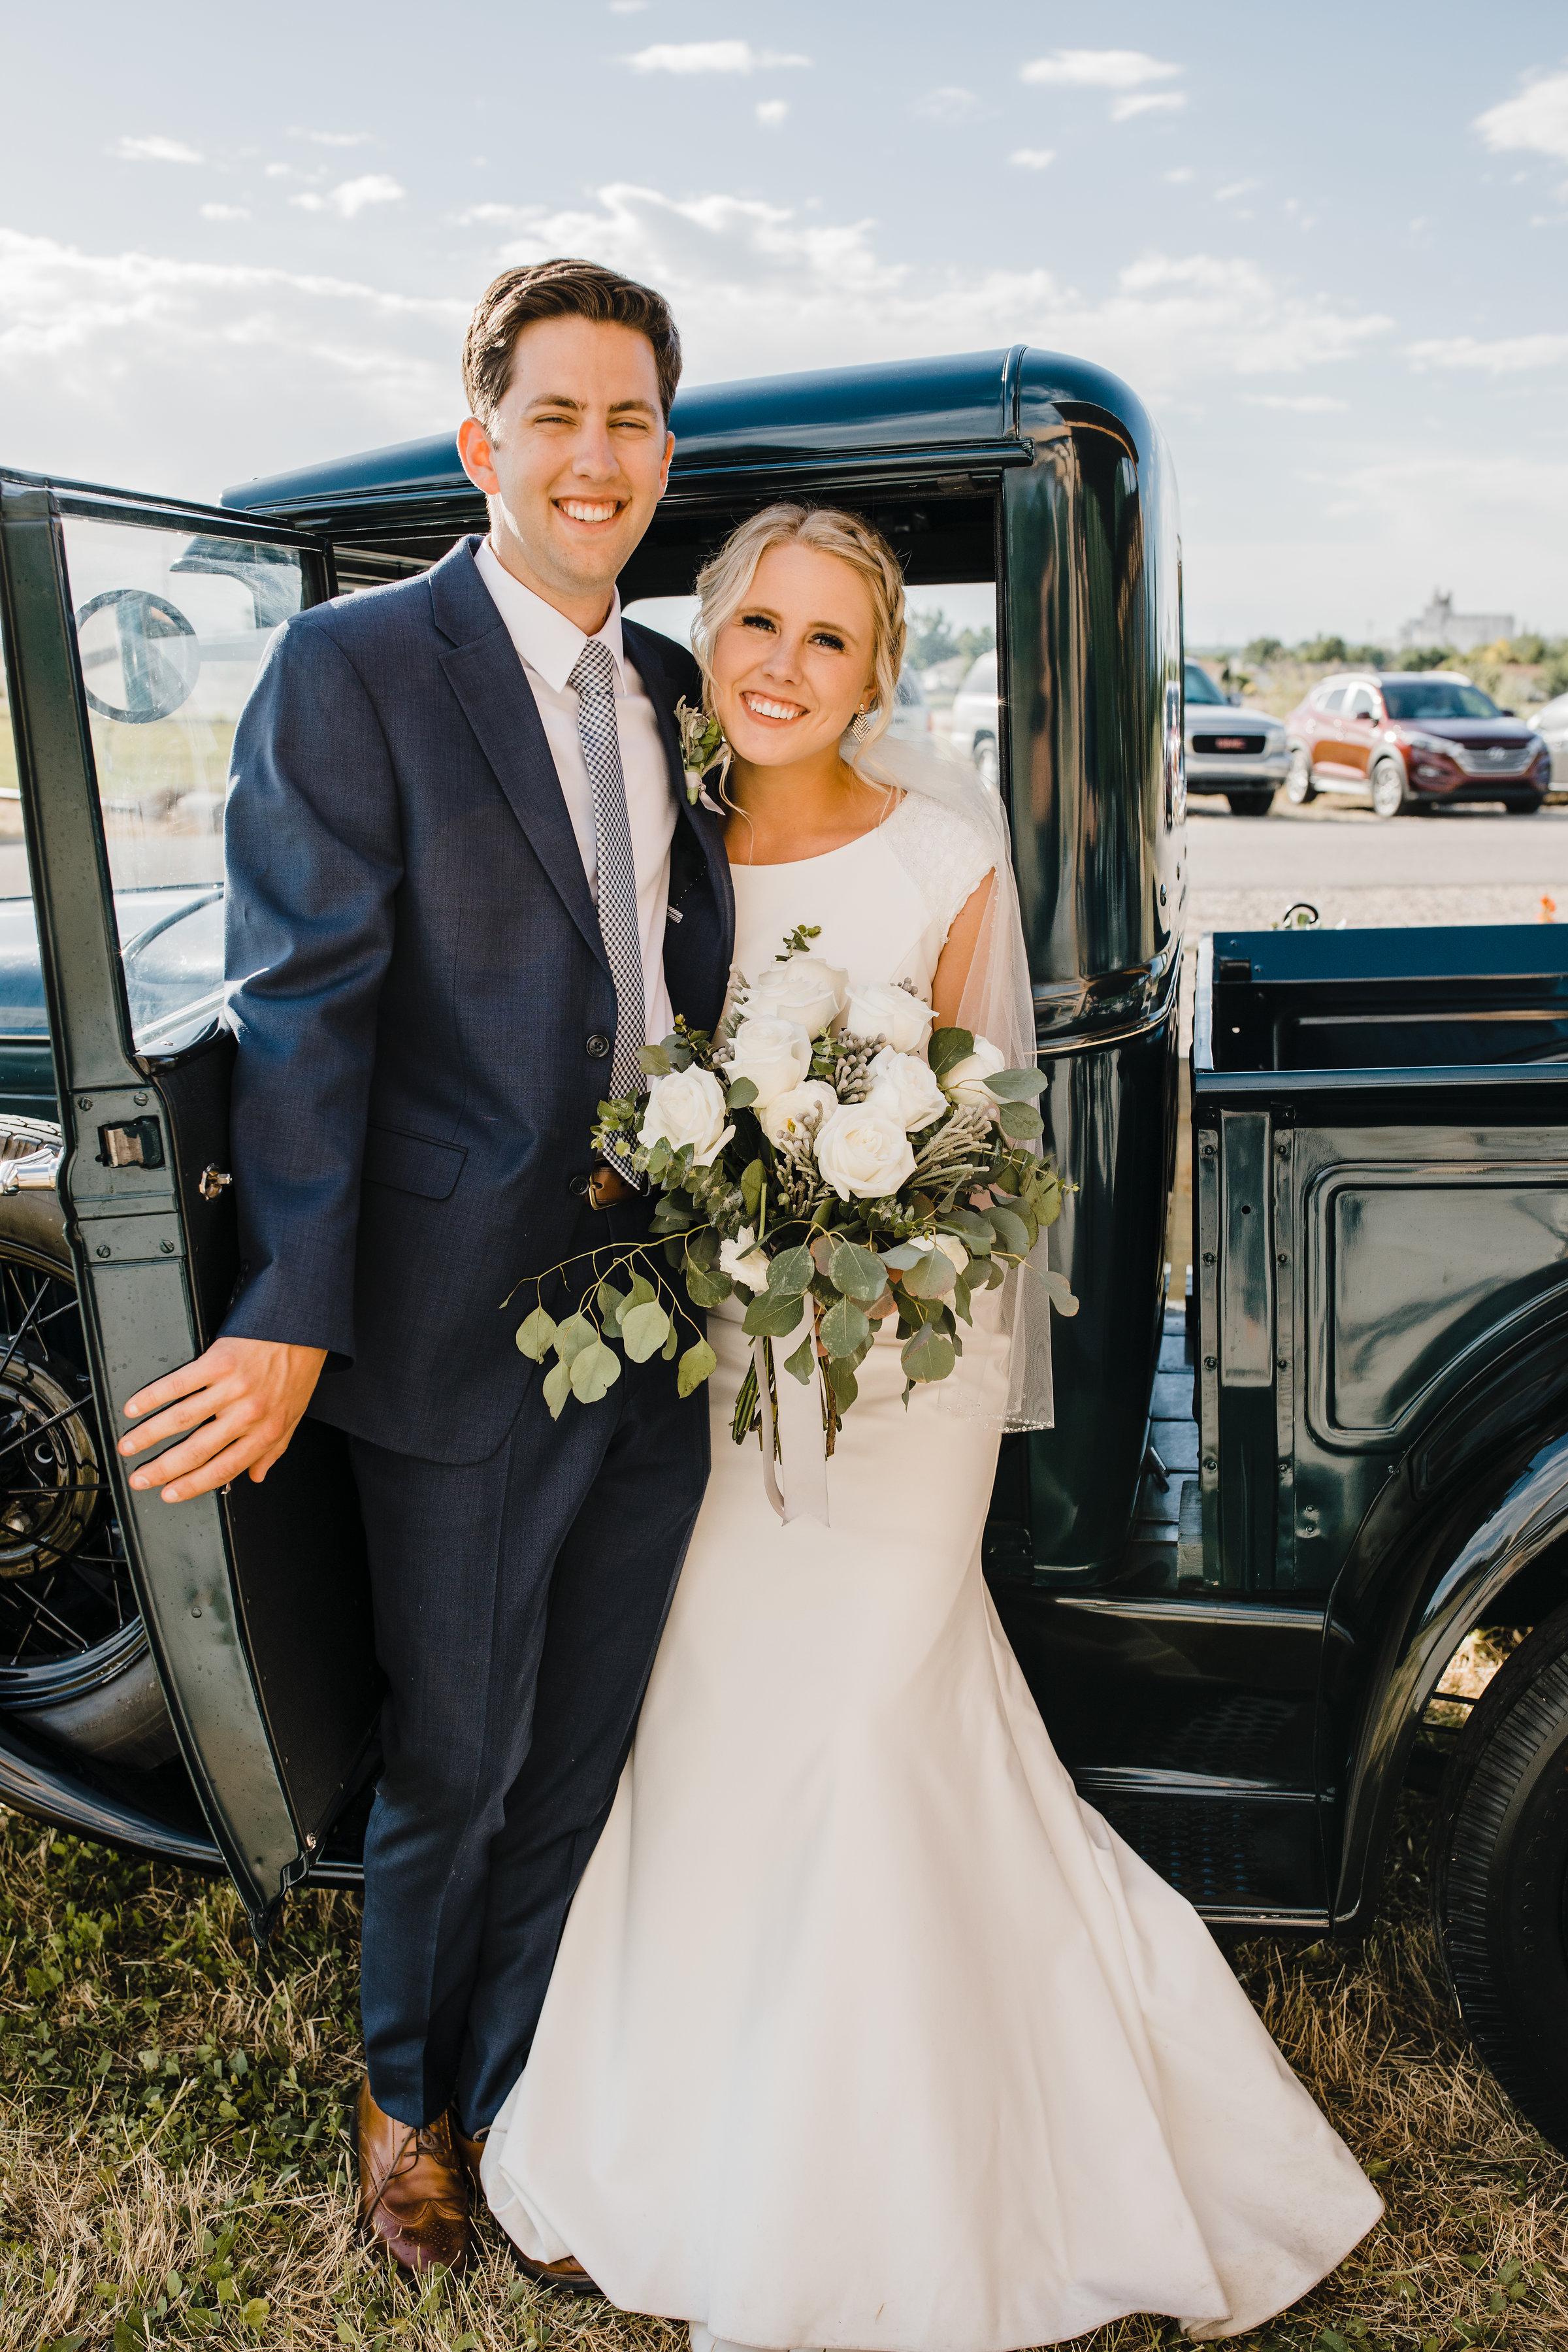 best wedding photographer in utah valley old car gettaway car couple smiling